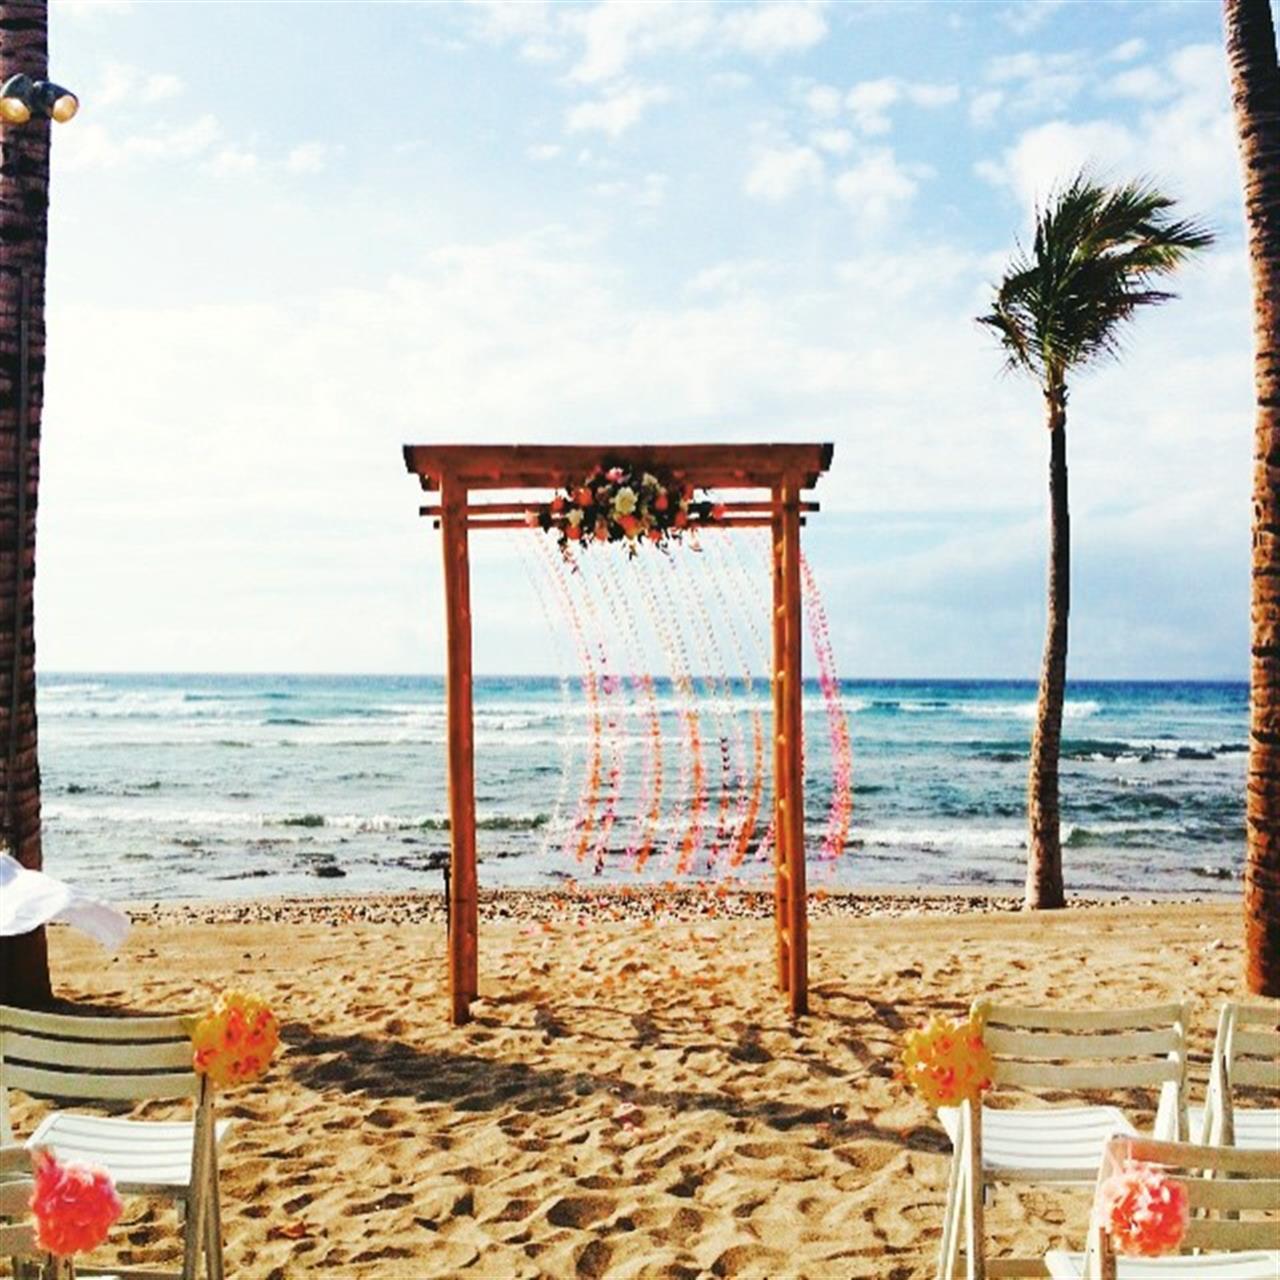 Another beautiful wedding at Mauna Lani.  The perfect destination for weddings and finding your Hawaiian dream home!  #maunalani #wedding #realestate #bigisland #leadingrelocal #?????? #??? #??? #????? #????